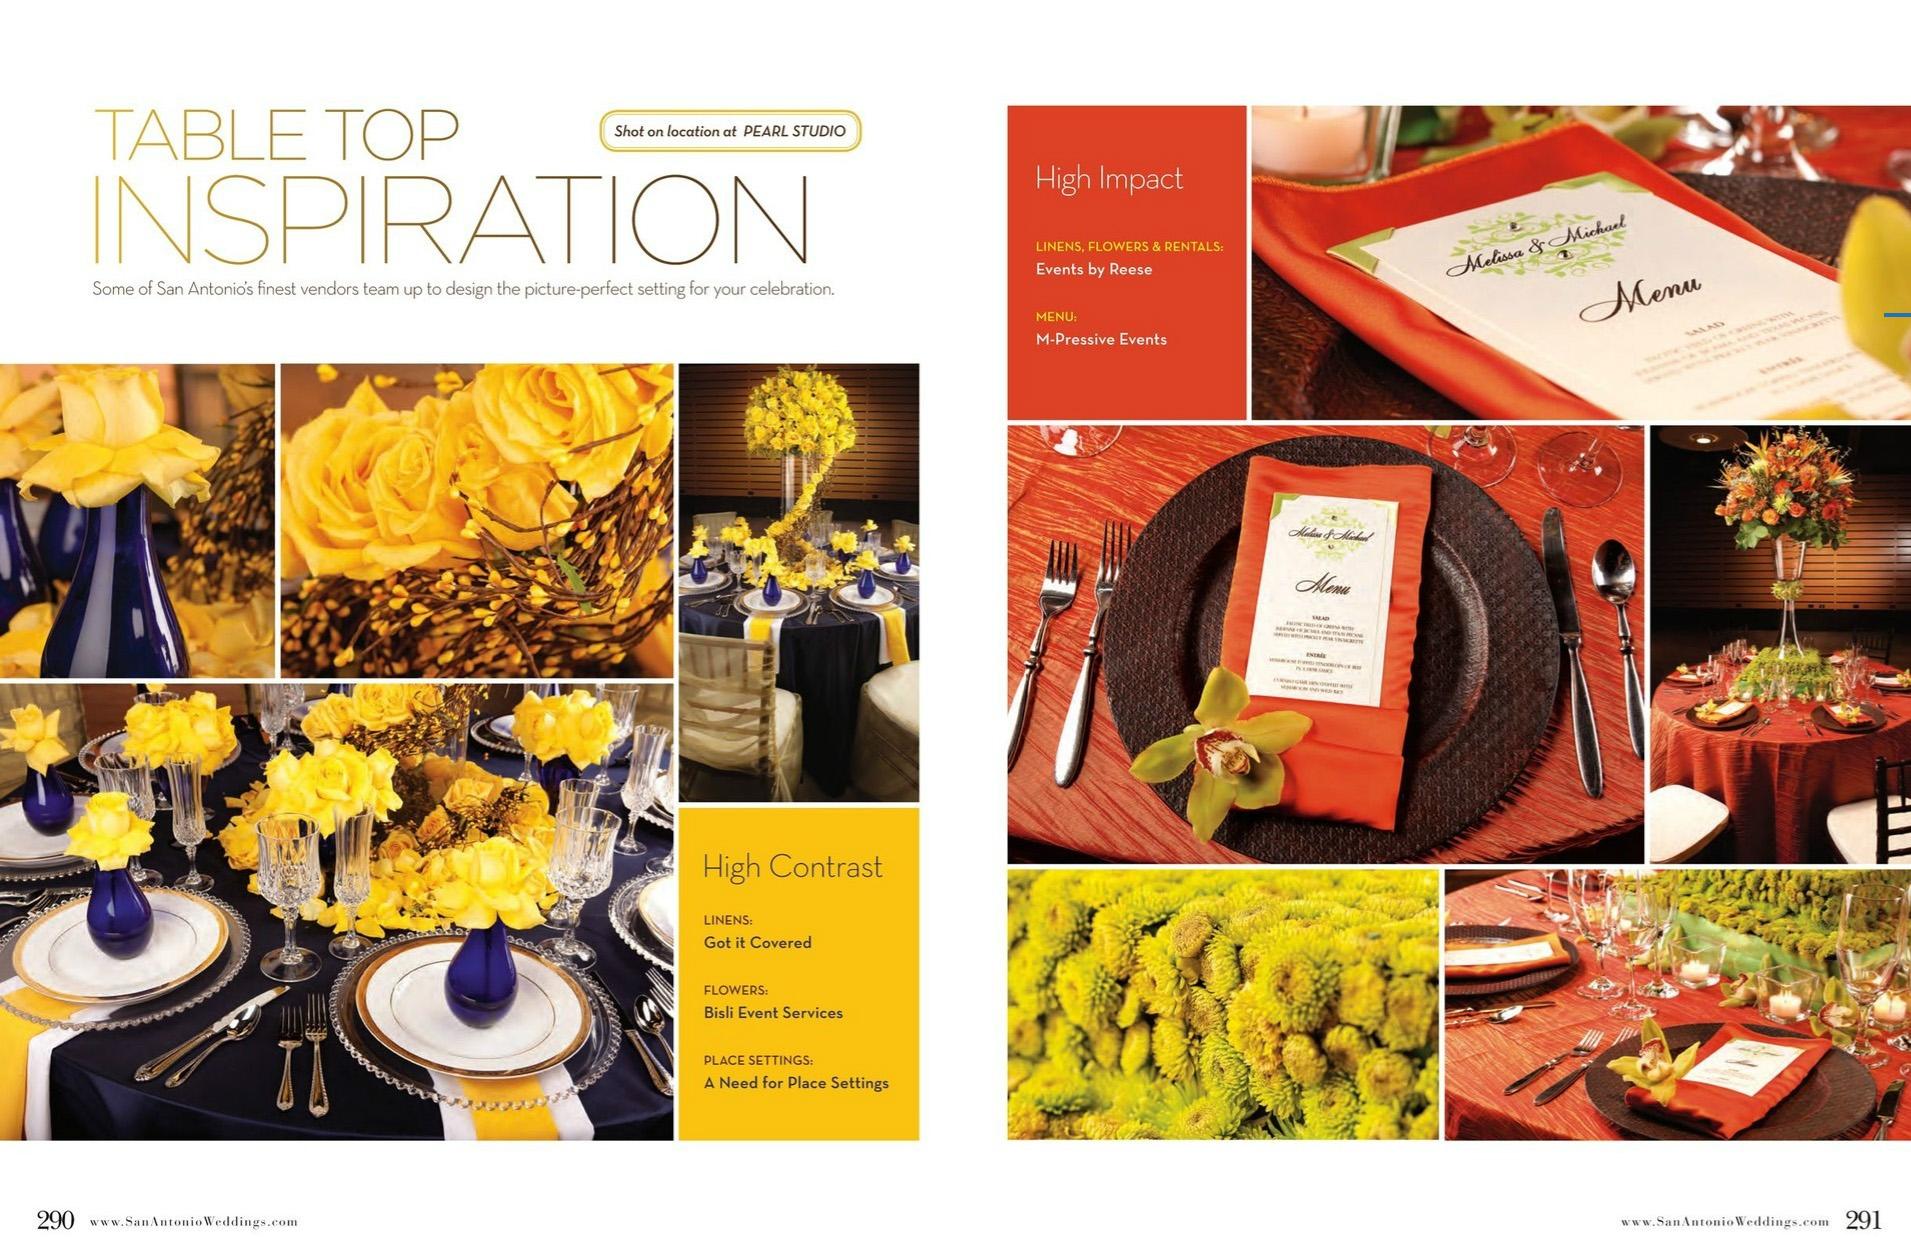 San Antonio Weddings Magazine Feature  (2010, Tabletop Inspiration)